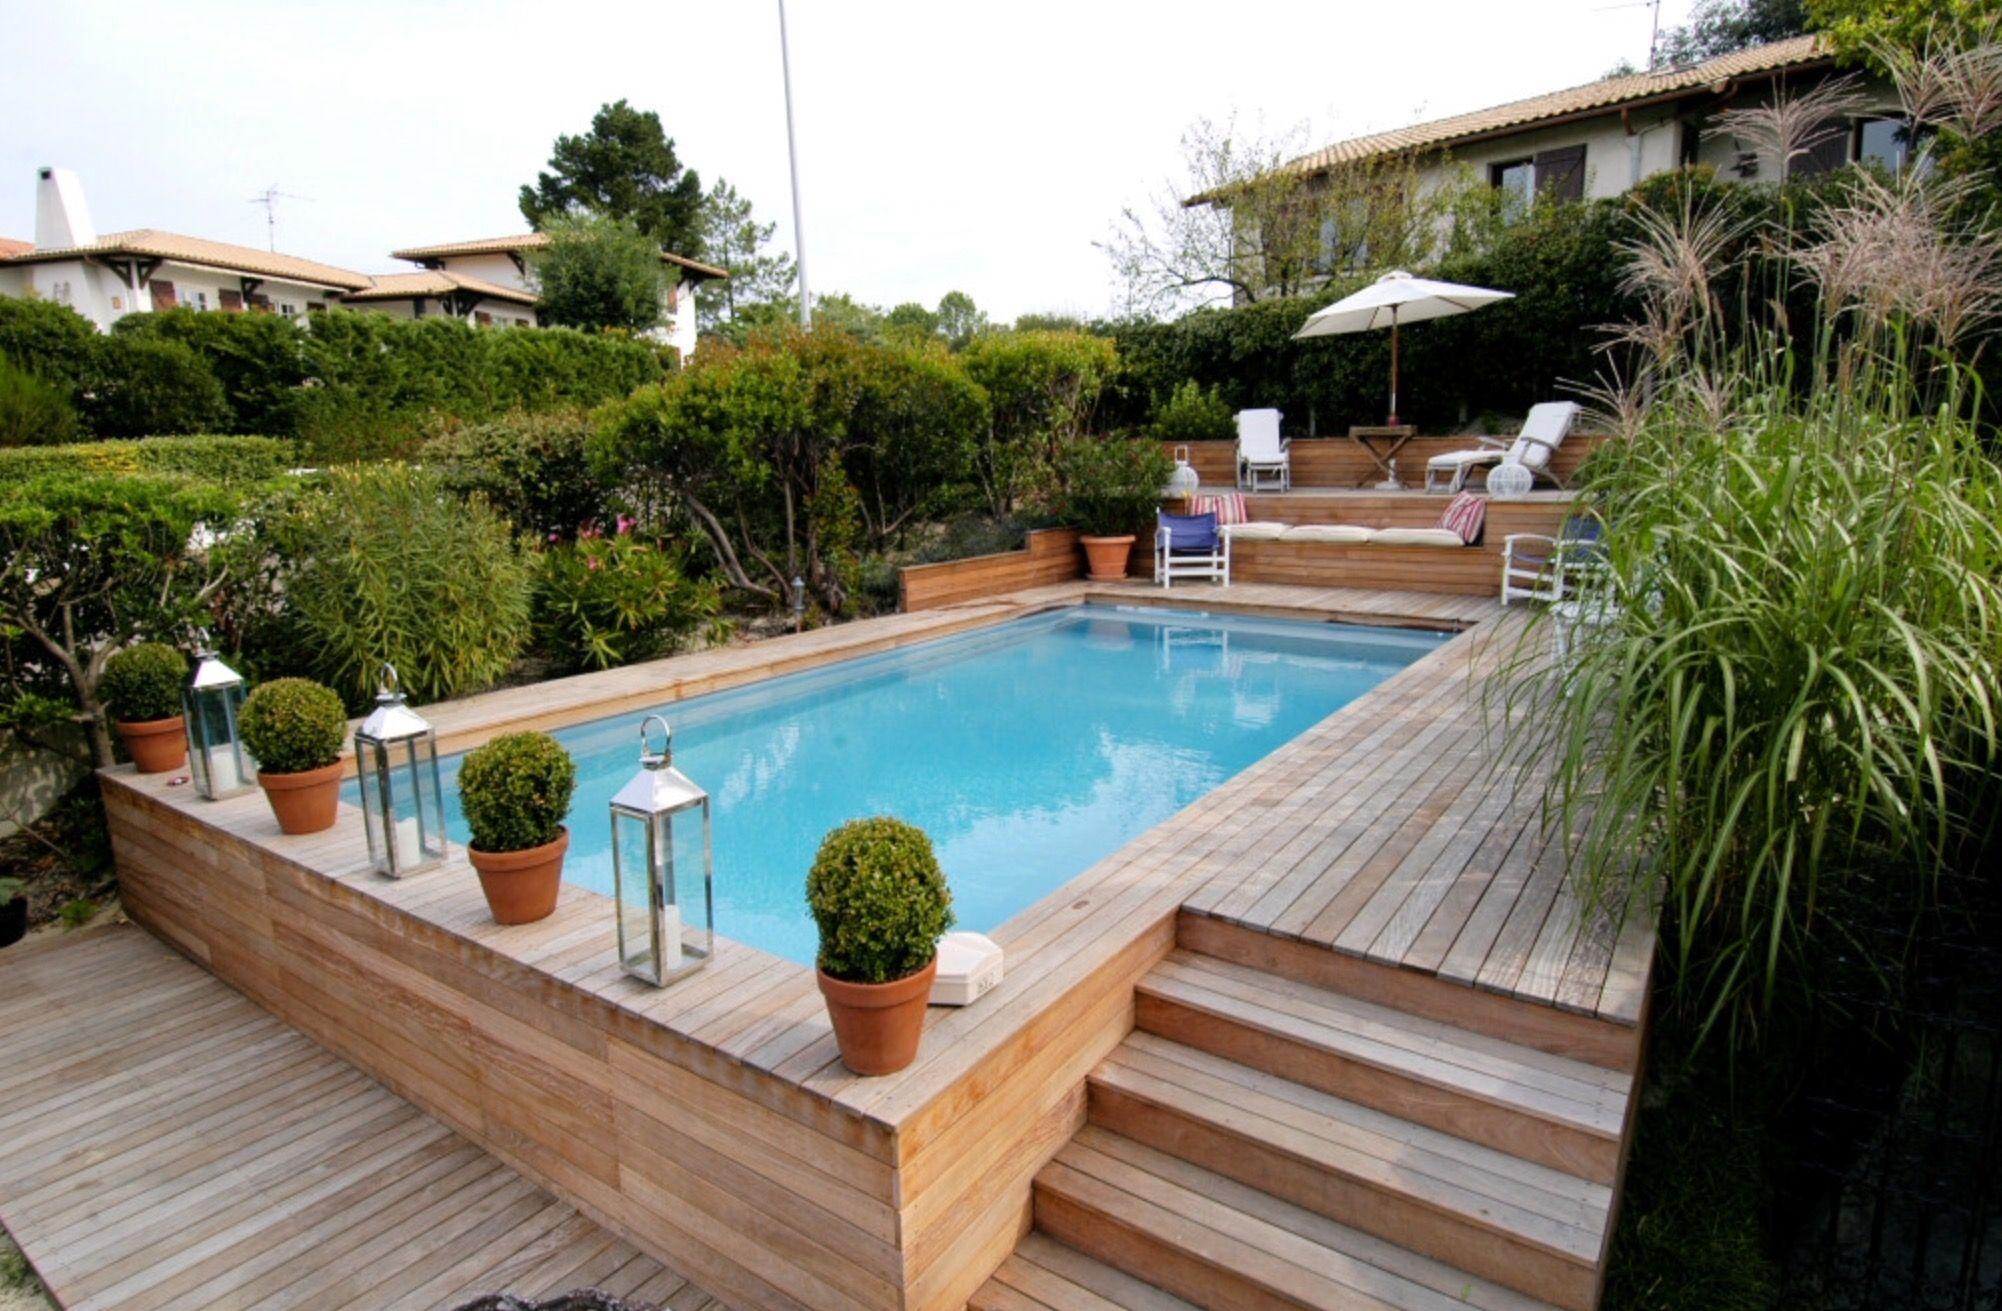 Piscine En Pierre Hors Sol pindavin bernardi on pool | backyard pool landscaping